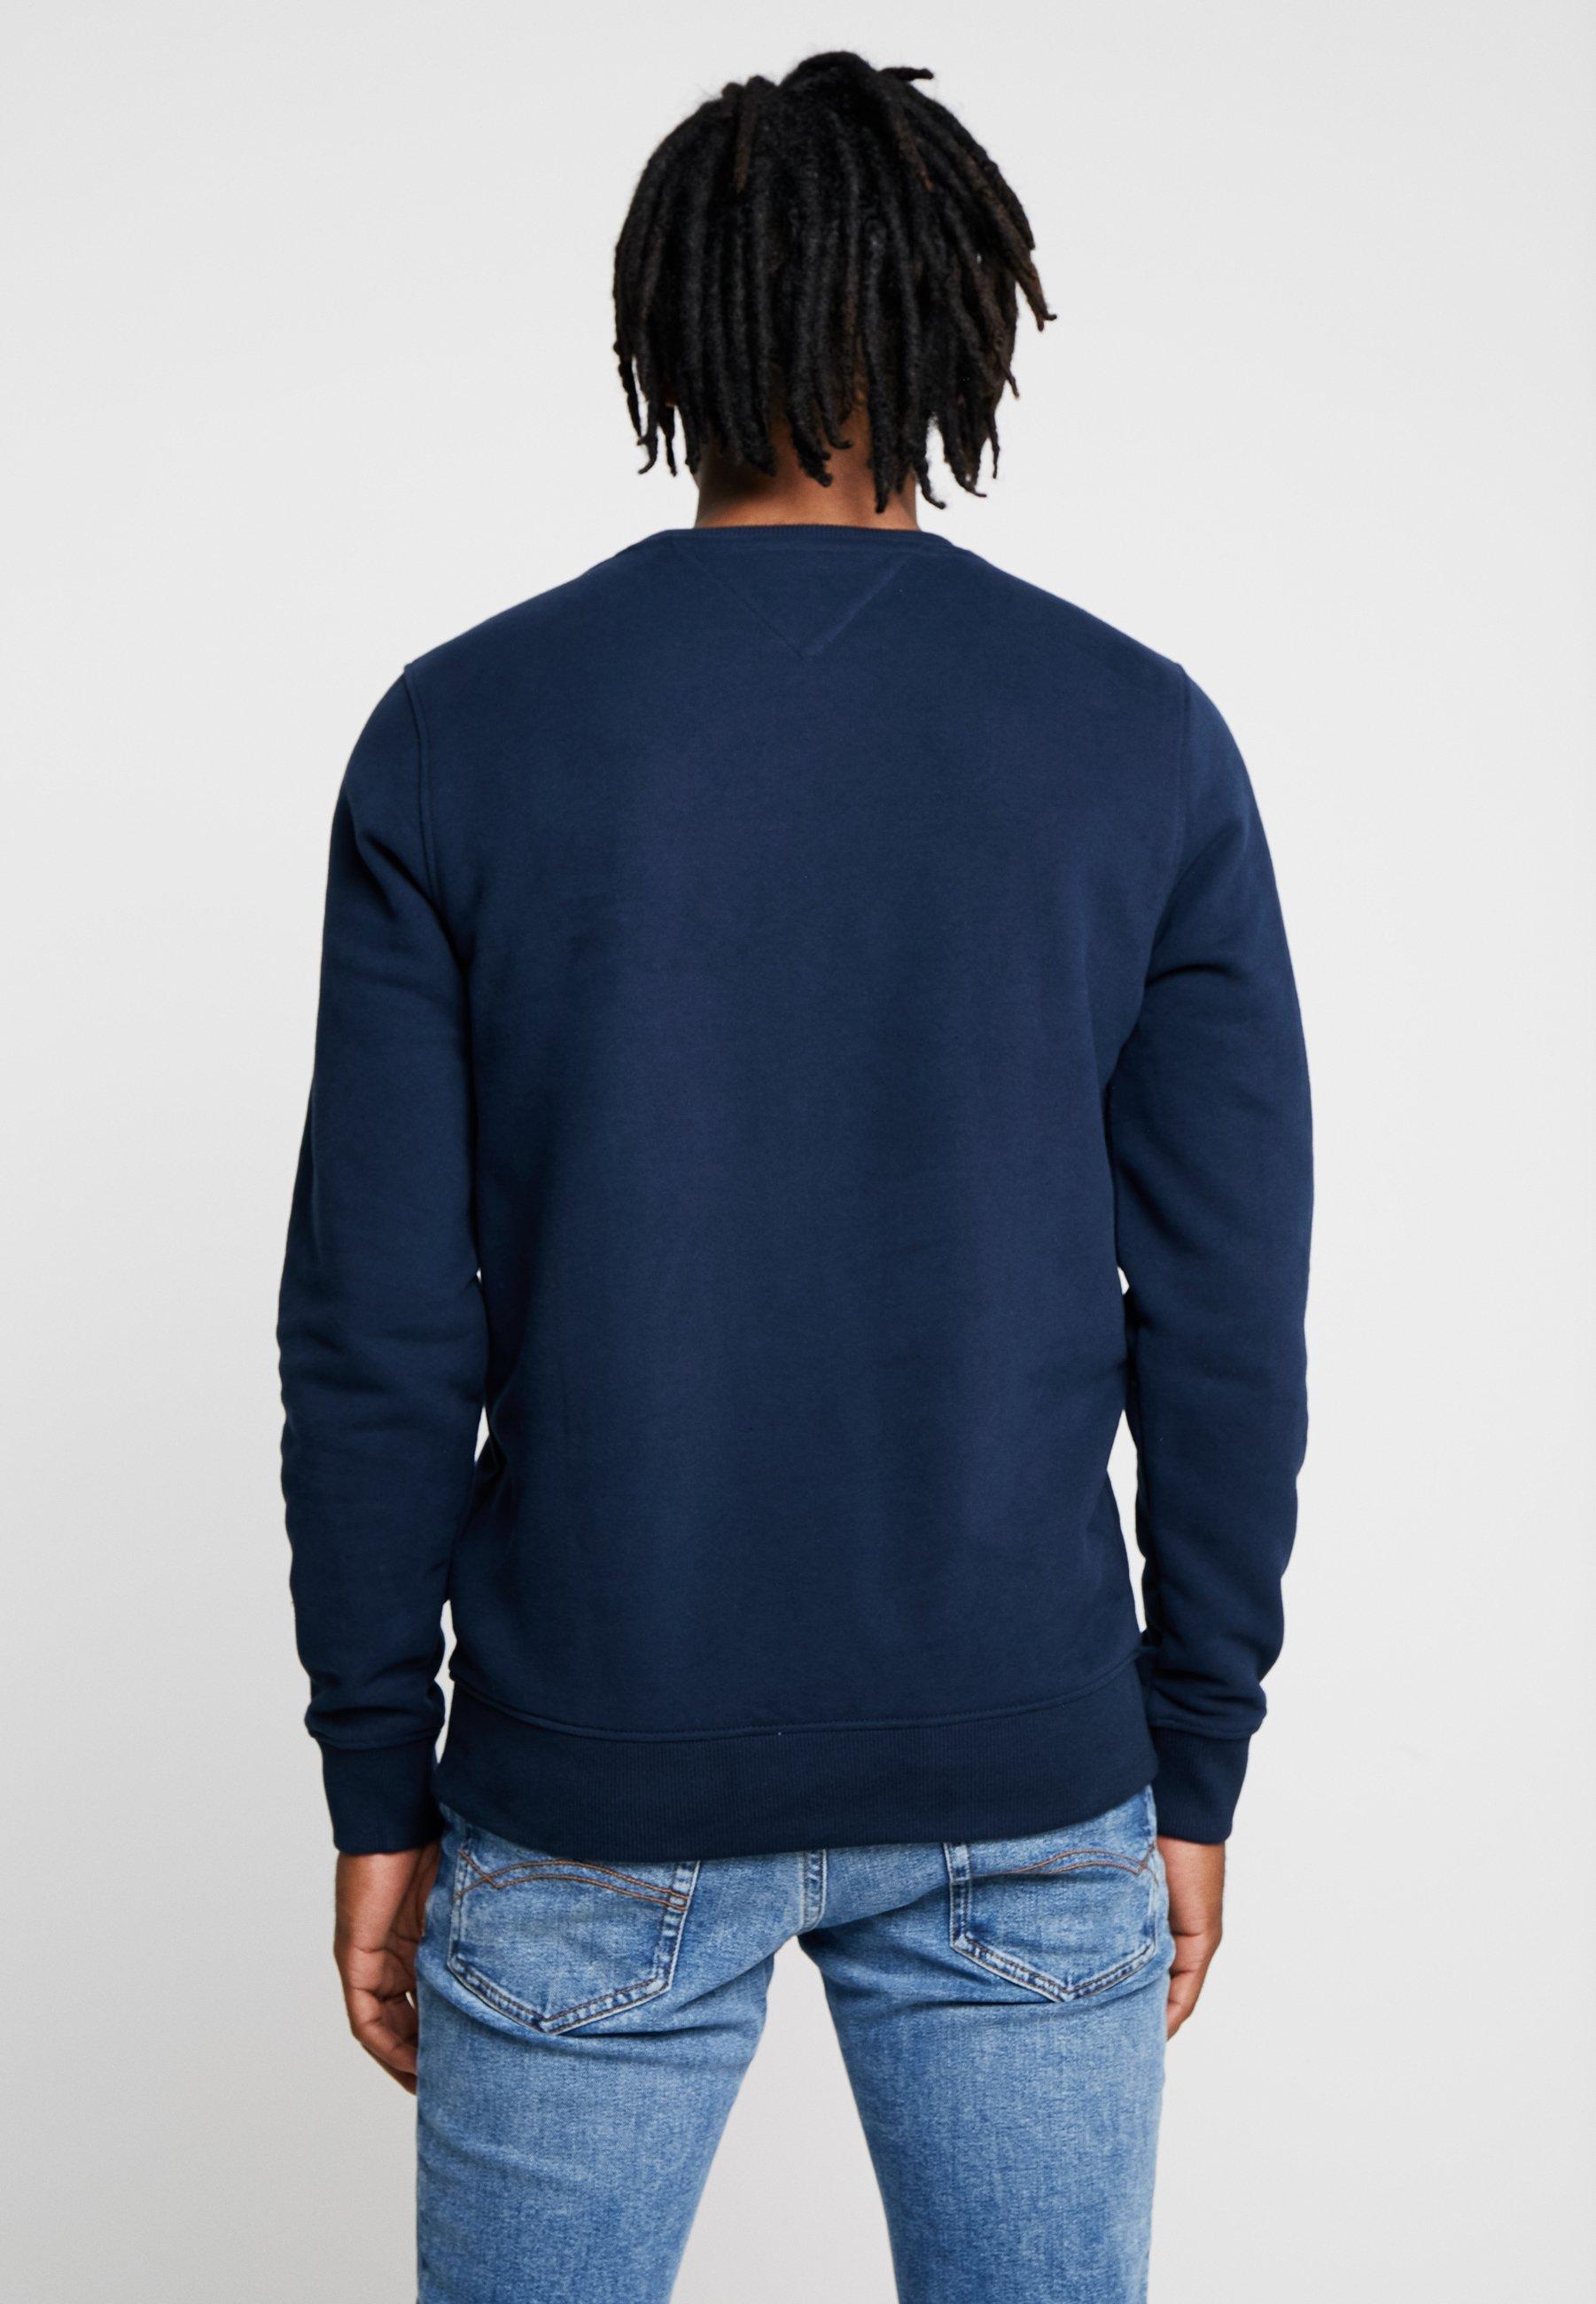 Split Blue CrewSweatshirt Block Logo Tommy Jeans hxtrdsQC